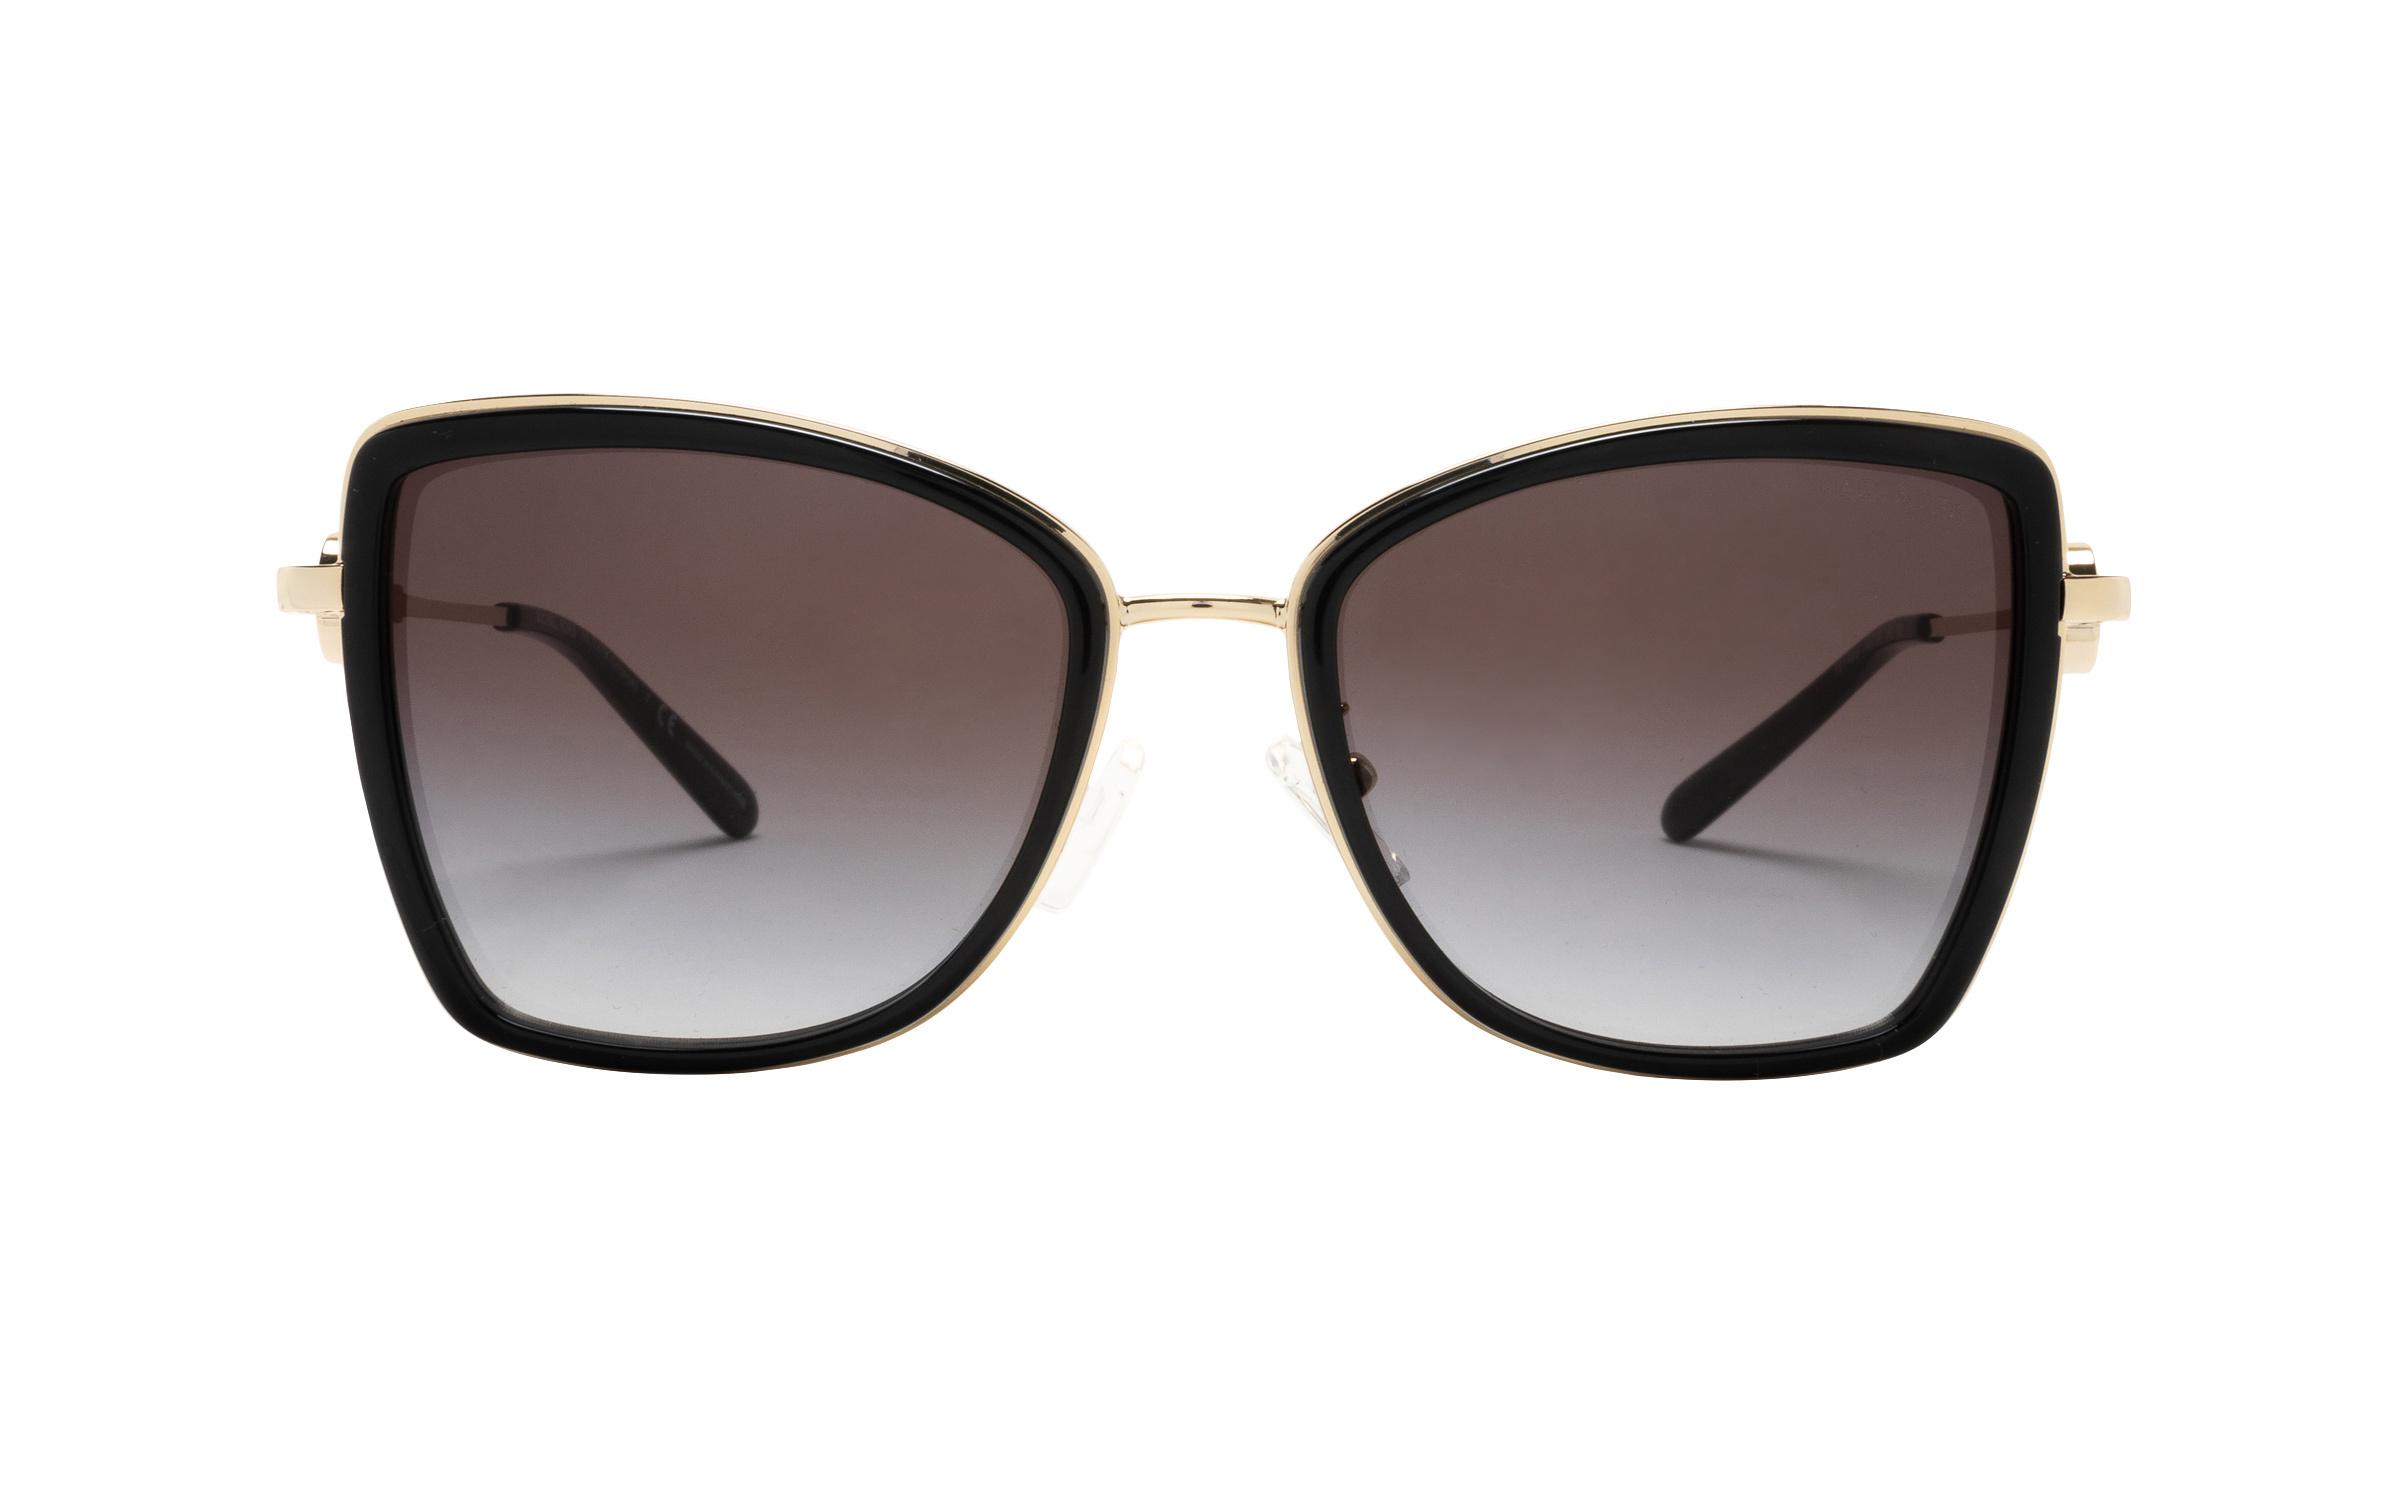 coastal.com - MichaelKors Michael Kors MK1067B Corsica 10148G 55 Sunglasses in Gold Black | Acetate/Metal – Online Coastal 161.00 USD